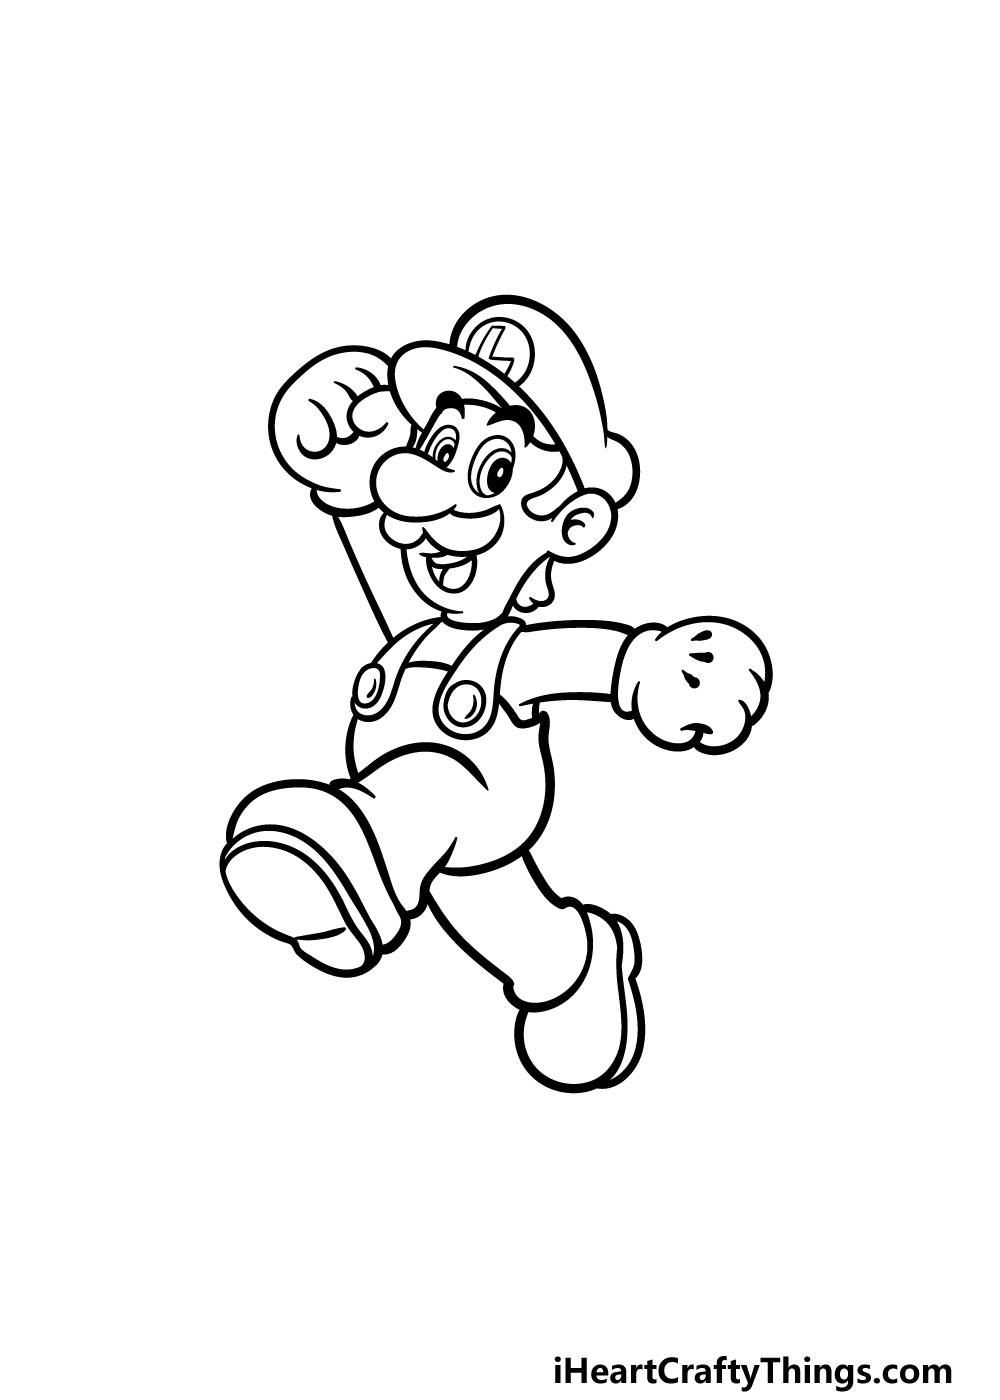 drawing luigi step 5